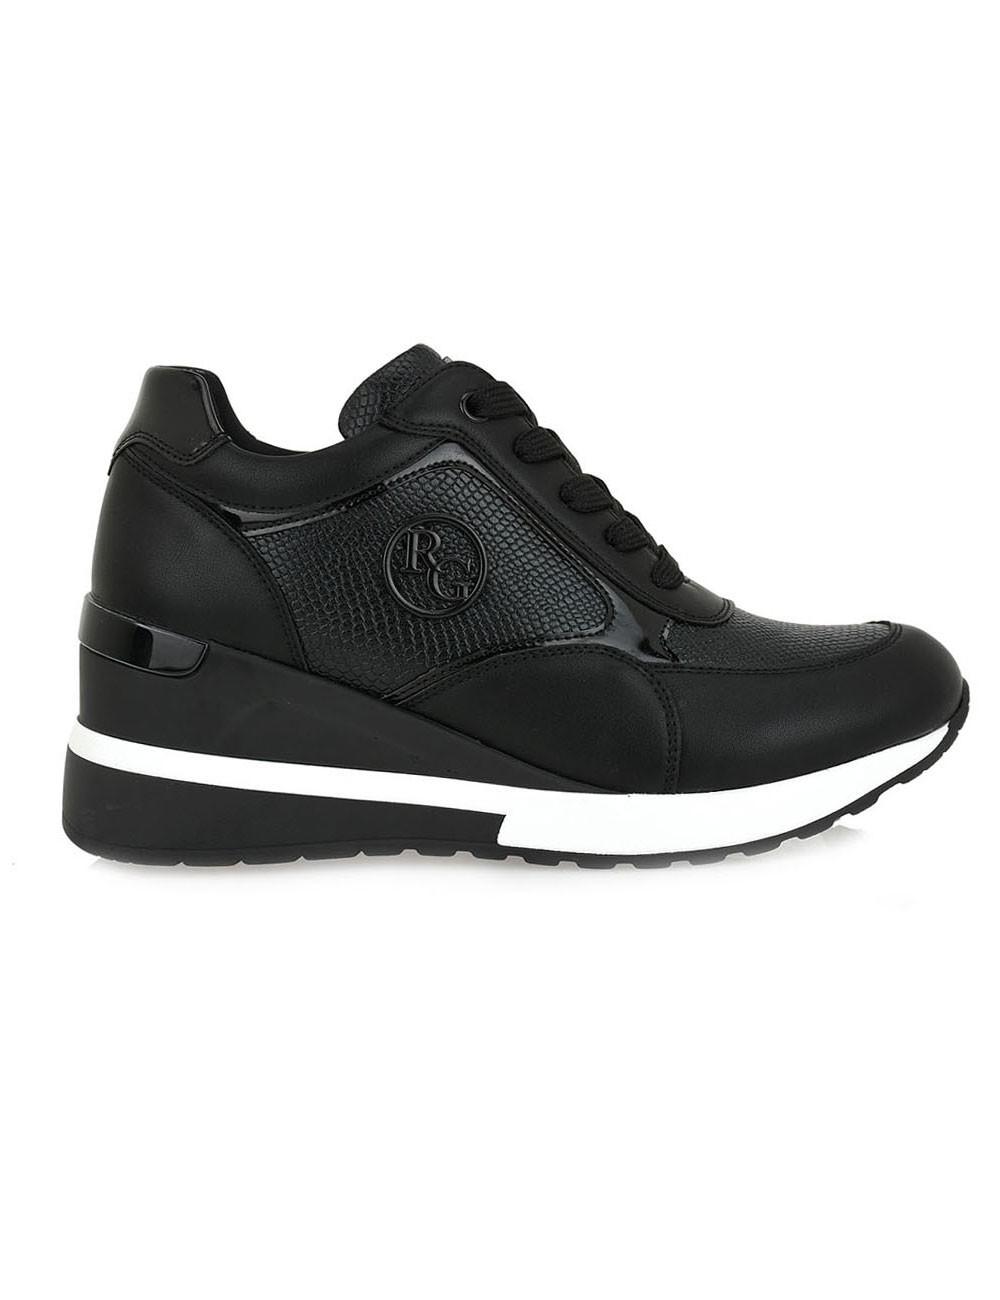 Renato Garini Γυναικεία Παπούτσια Sneakers 929-19R Μαύρο Φίδι N119R929334F